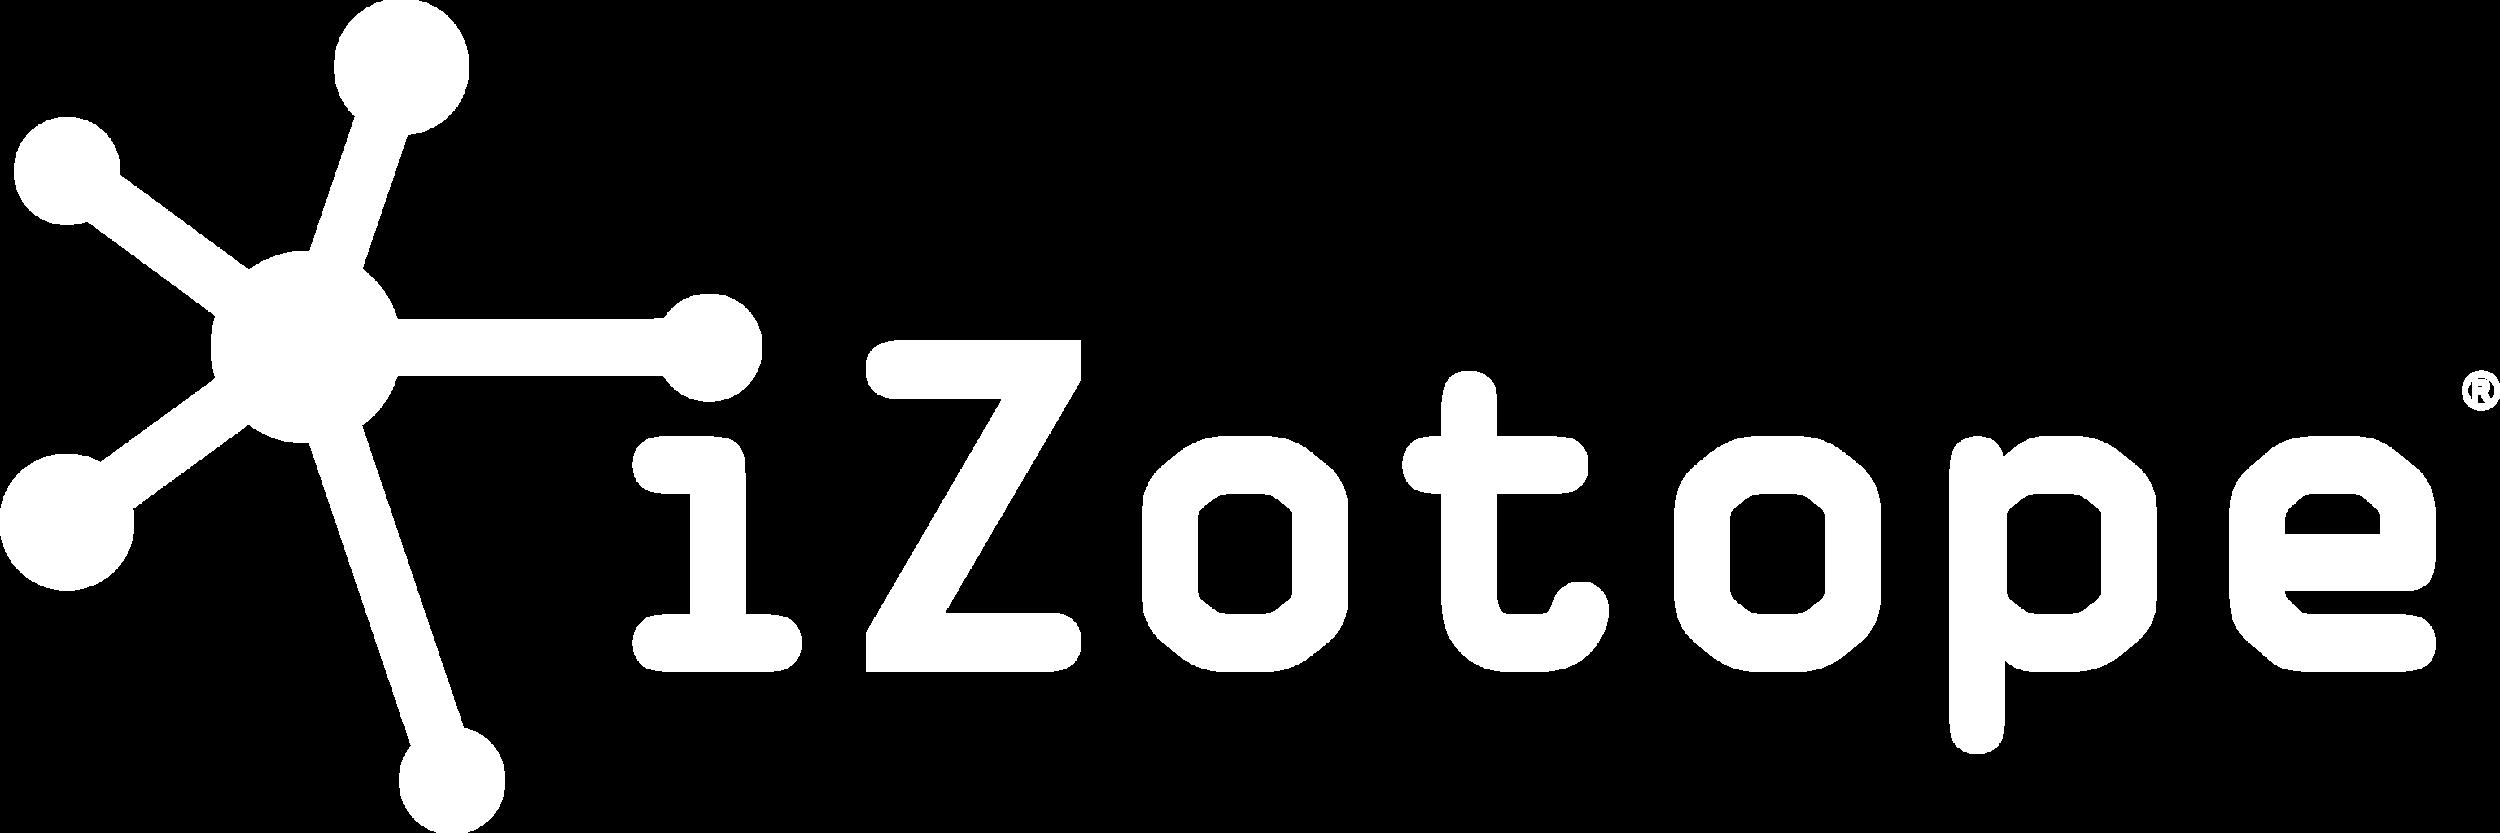 izotope-logo-white-cut